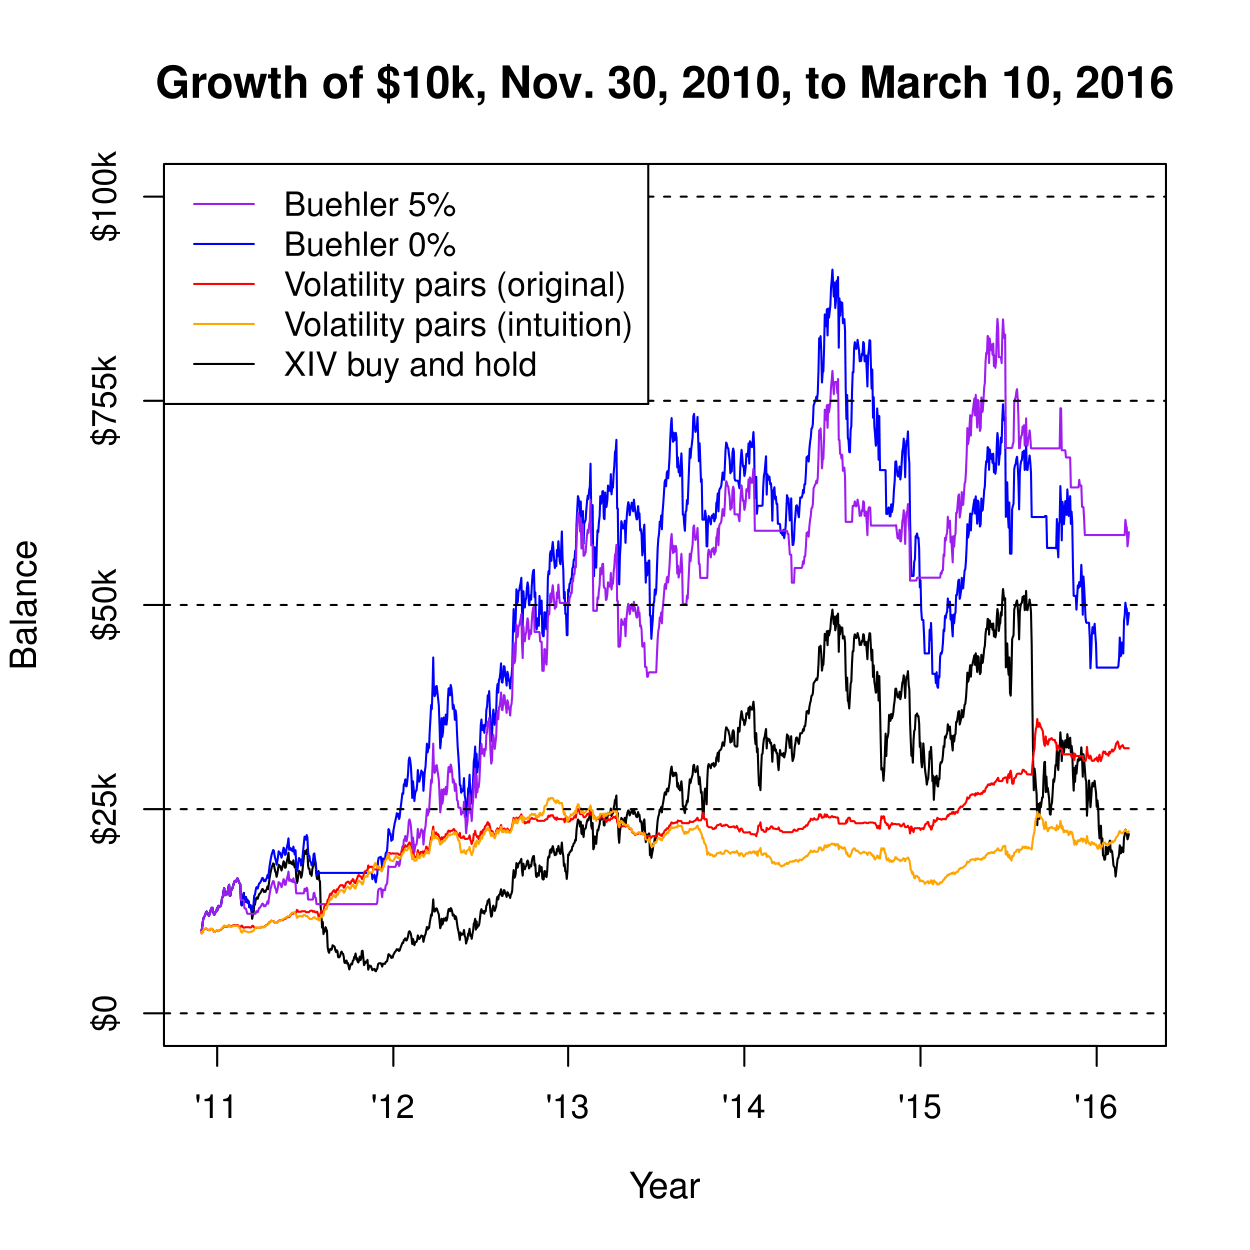 Volatility spread trading strategies